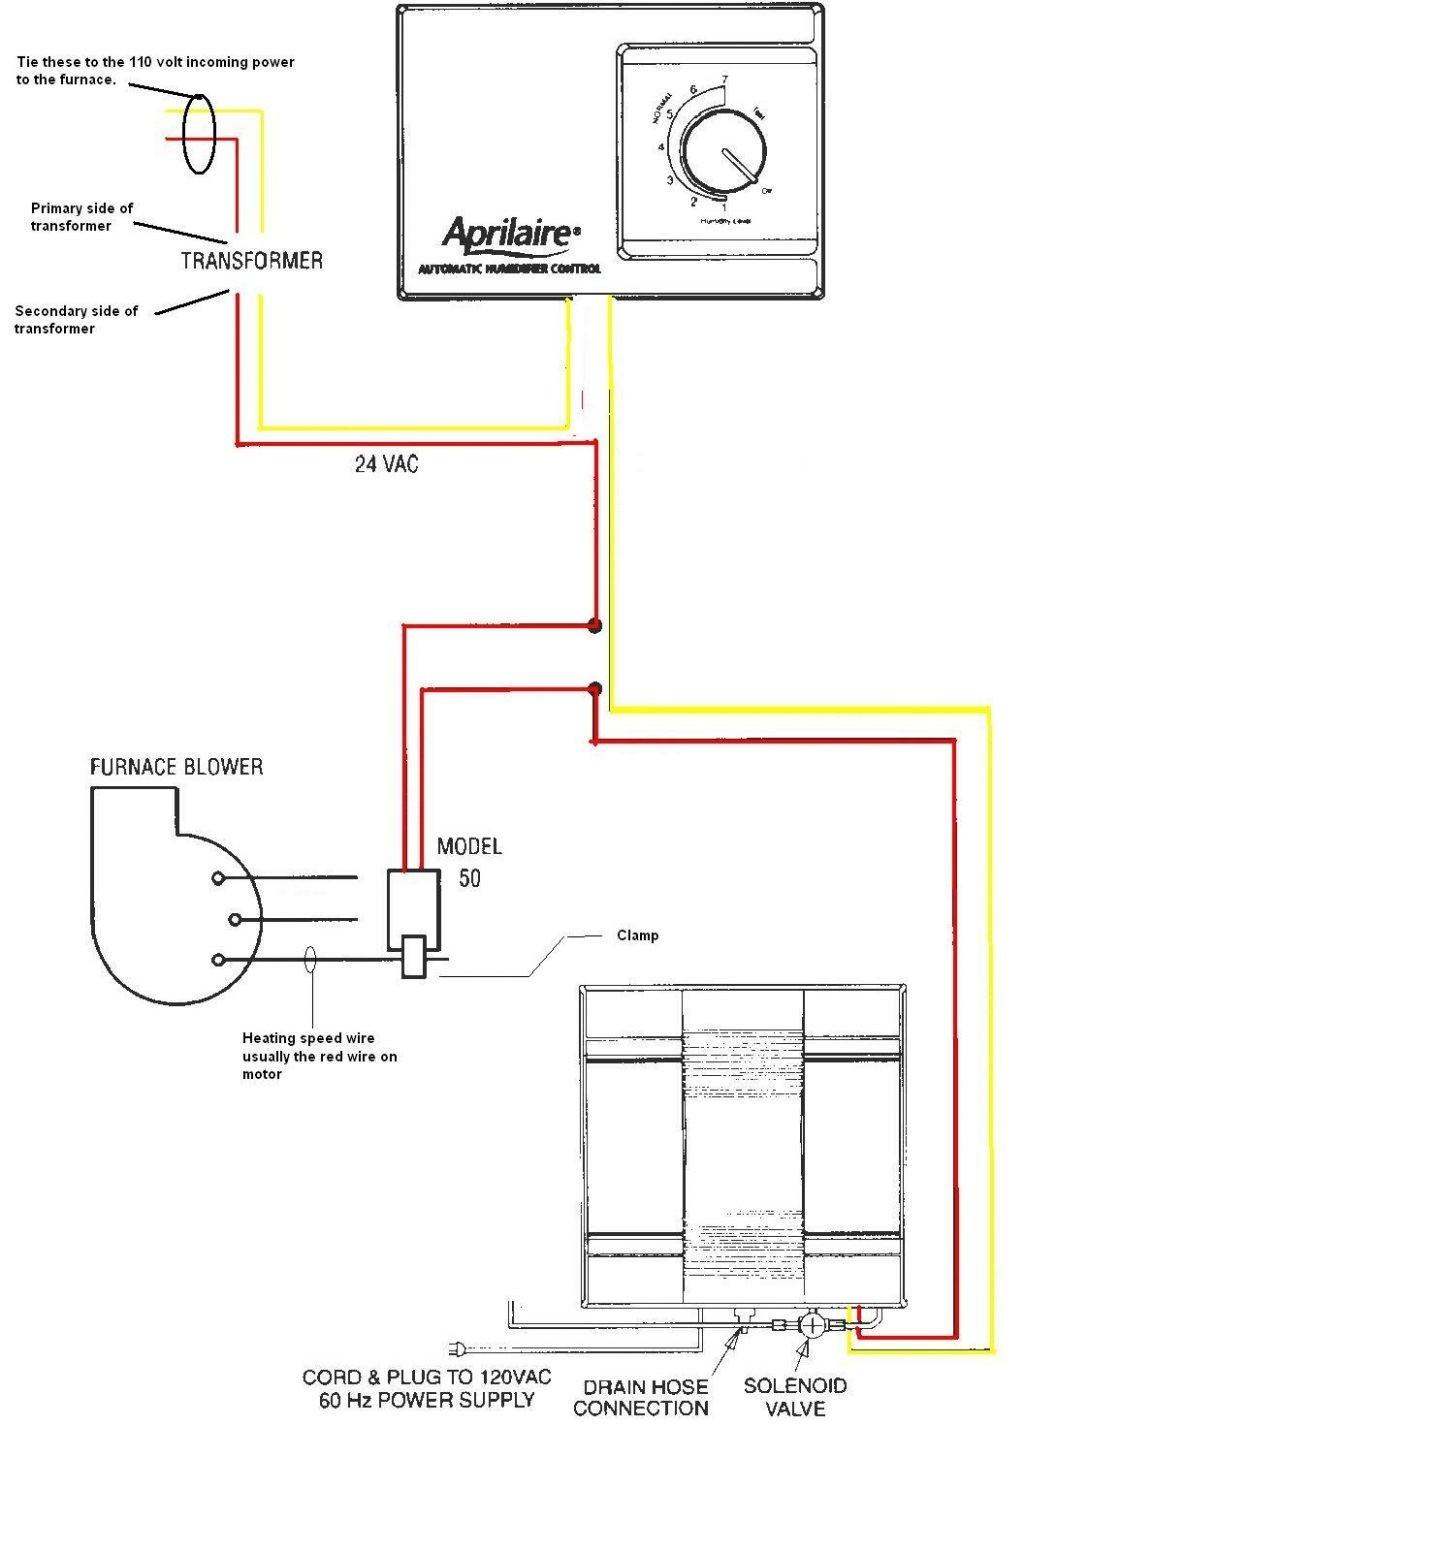 hight resolution of whole house fan timer switch awesome wiring diagram image hampton bay fan wiring diagram attic fan